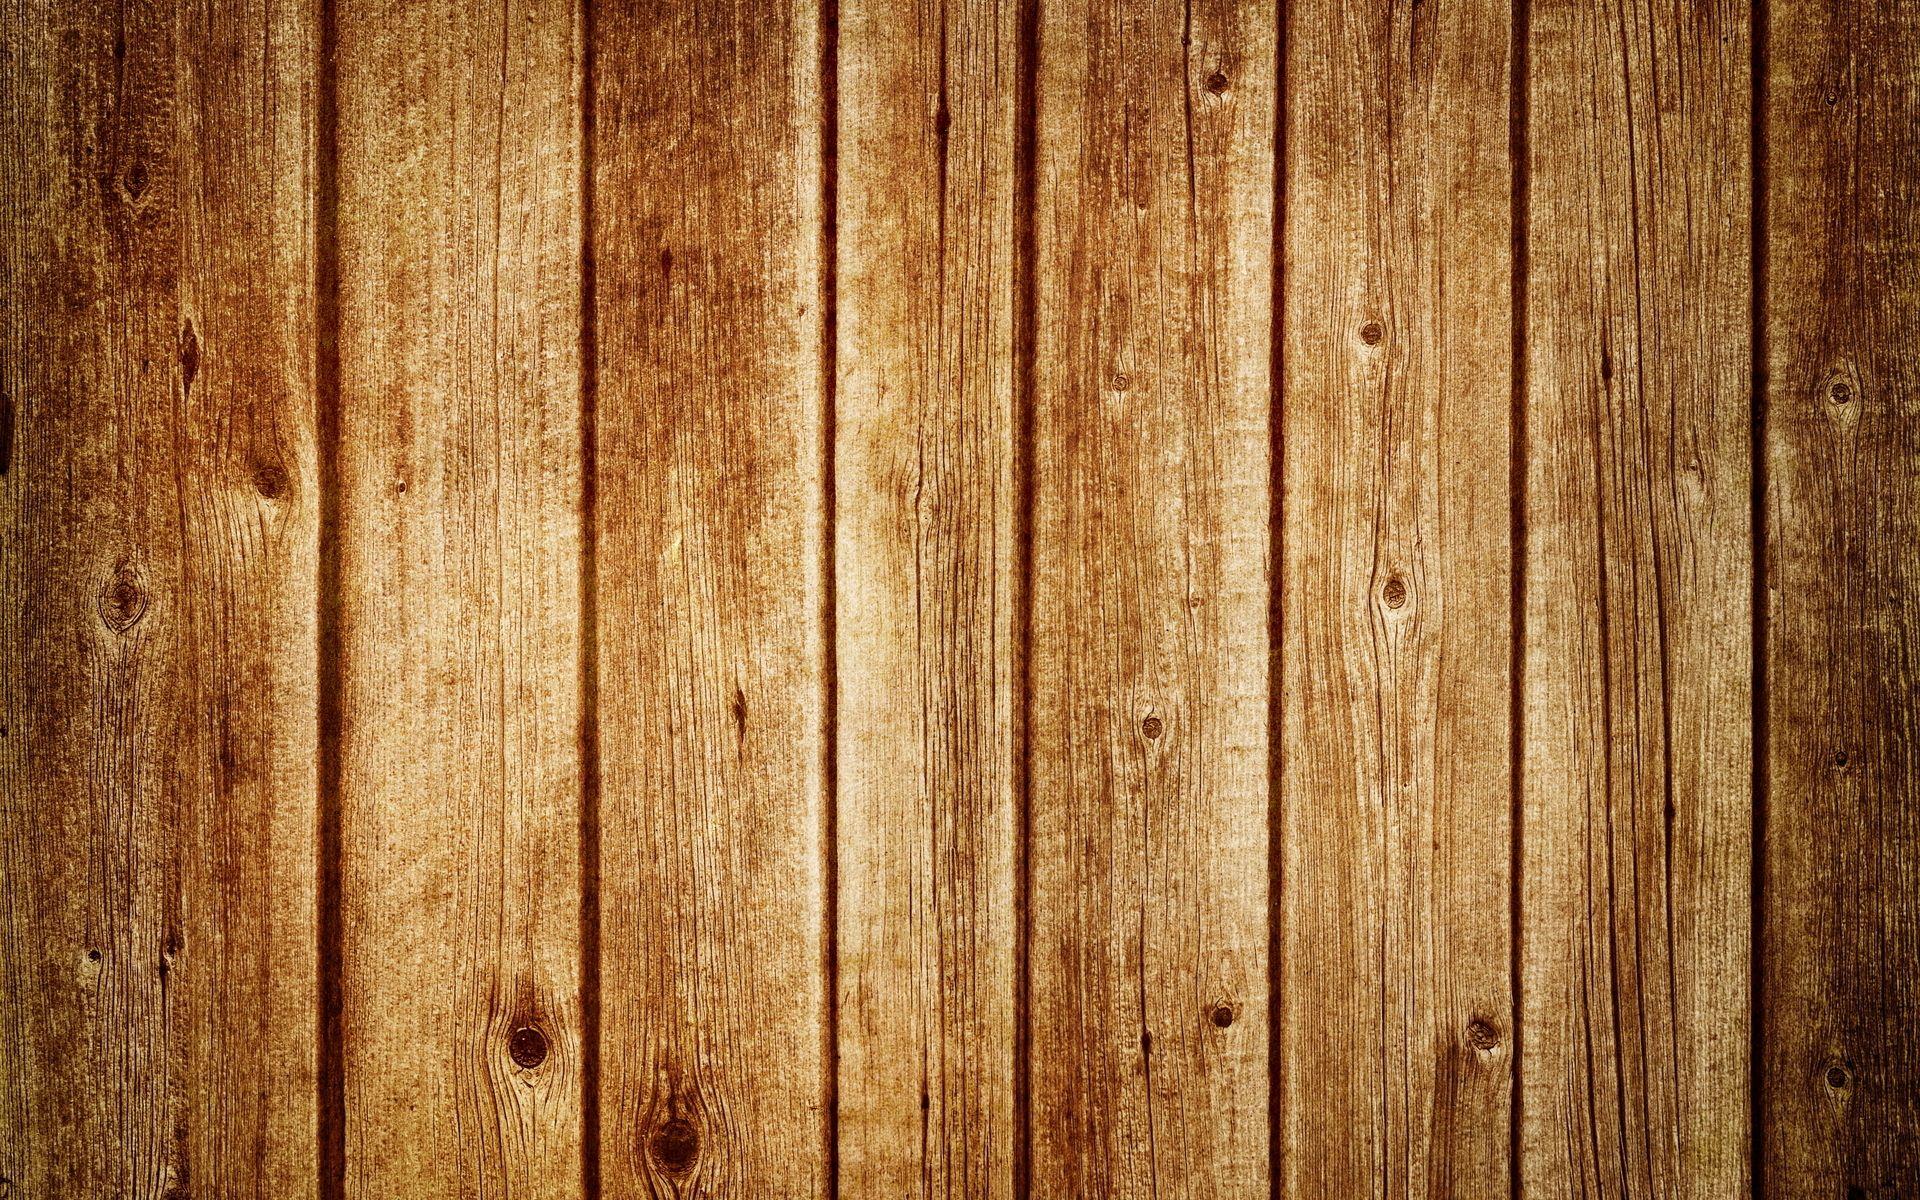 Vintage Wood Wallpaper Hd Wallpaper Free Download 3 Hd Wallpapers